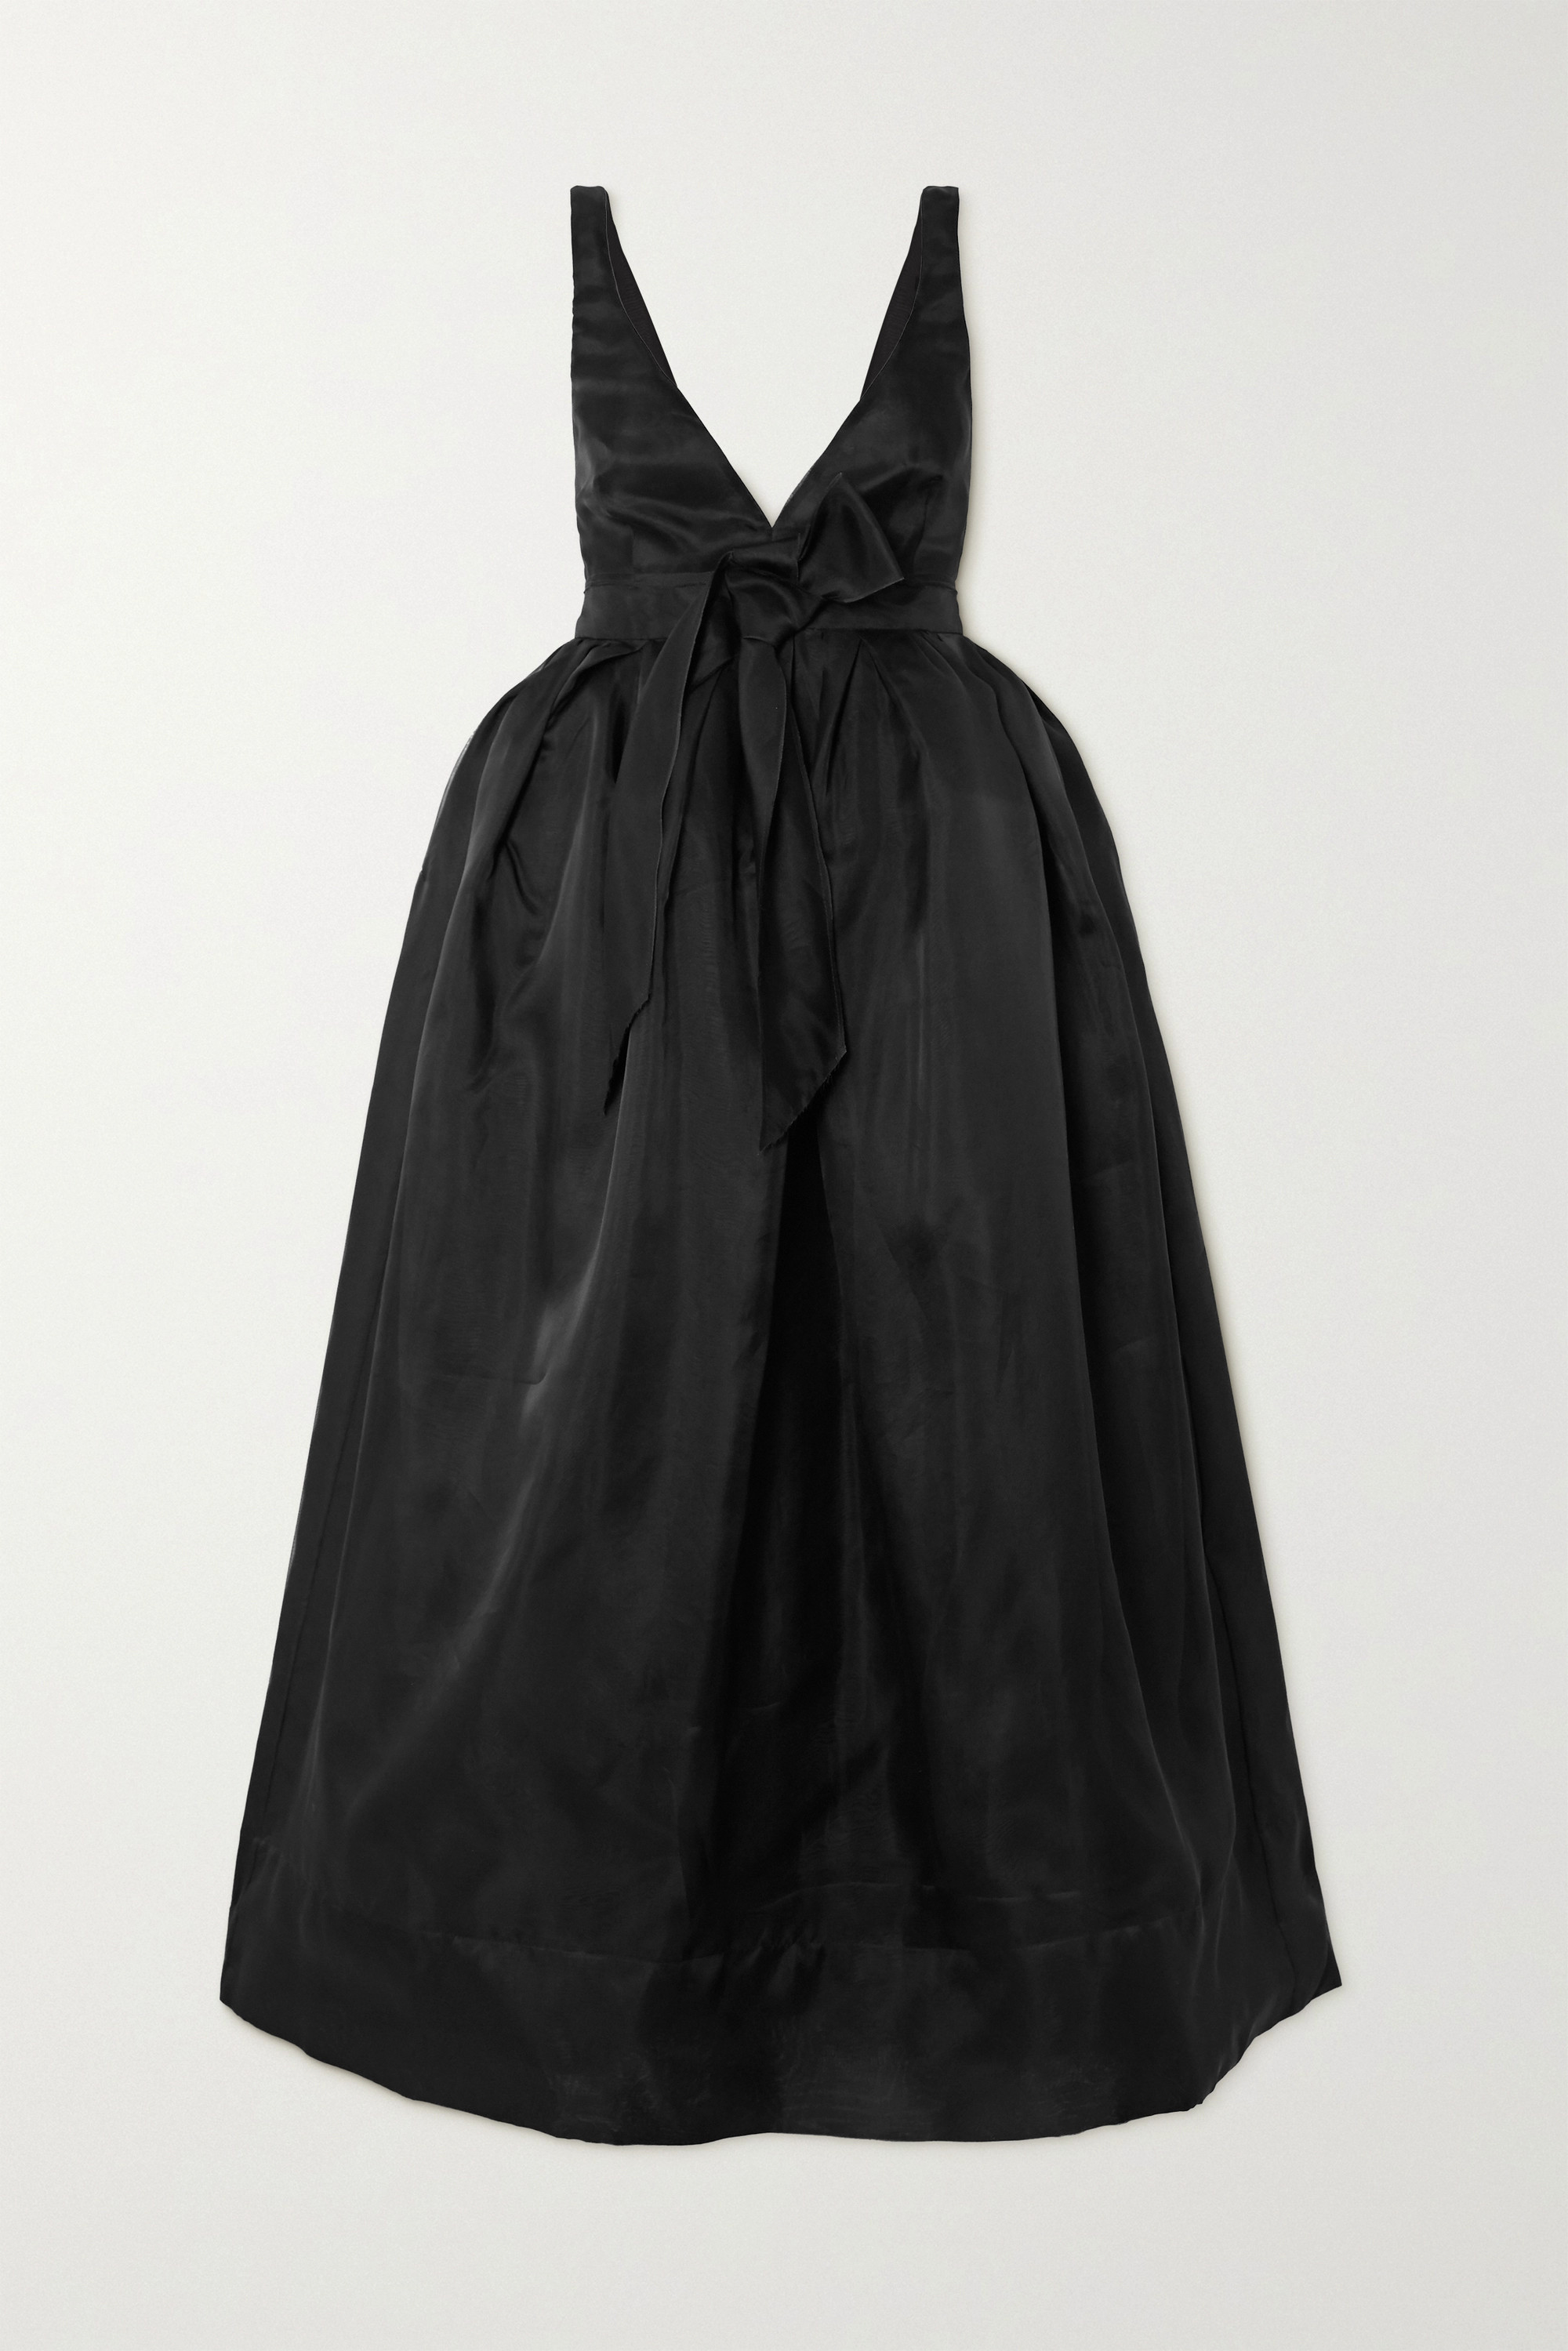 Brock Collection Bow-detailed silk-organza midi dress